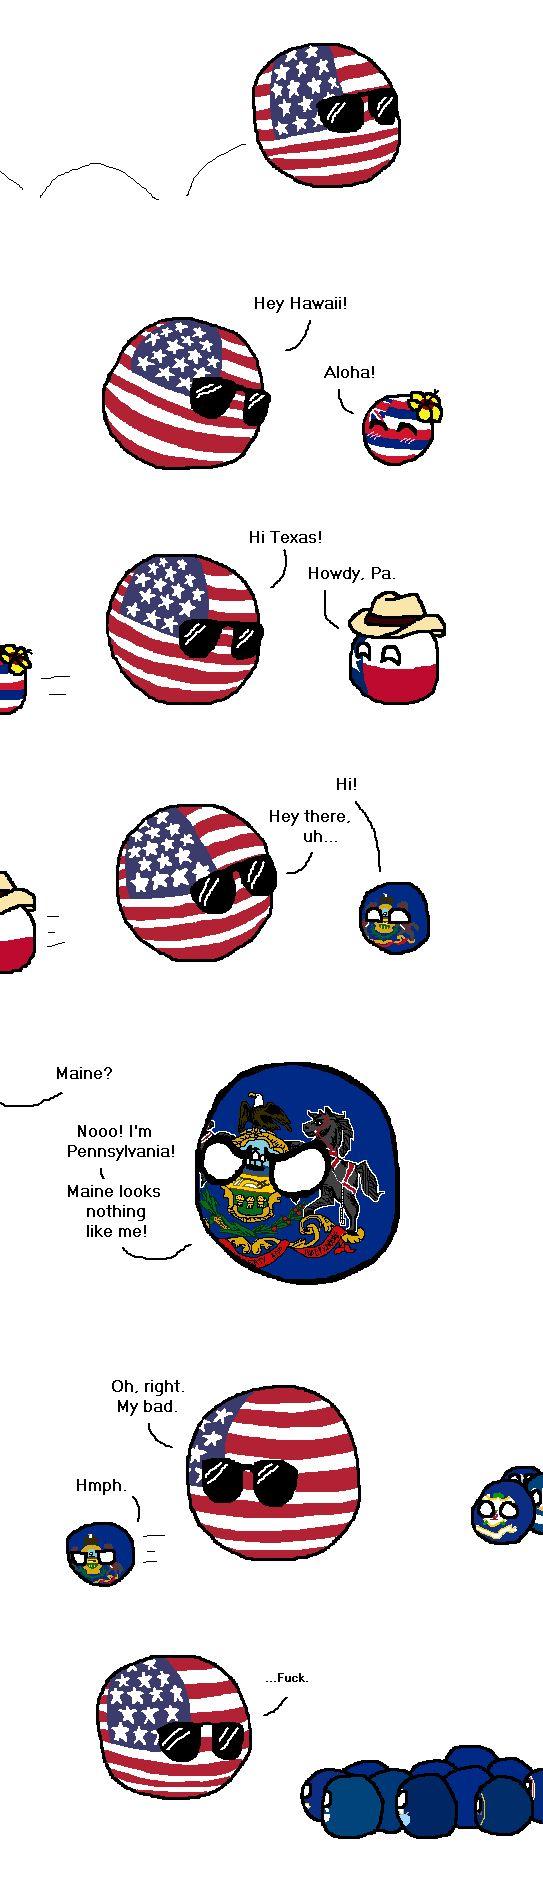 Distinguishing Traits ( USA, Hawaii State, Texas State, Pennsylvania ) by Mizuneko-chan #stateball #polandball #countryball